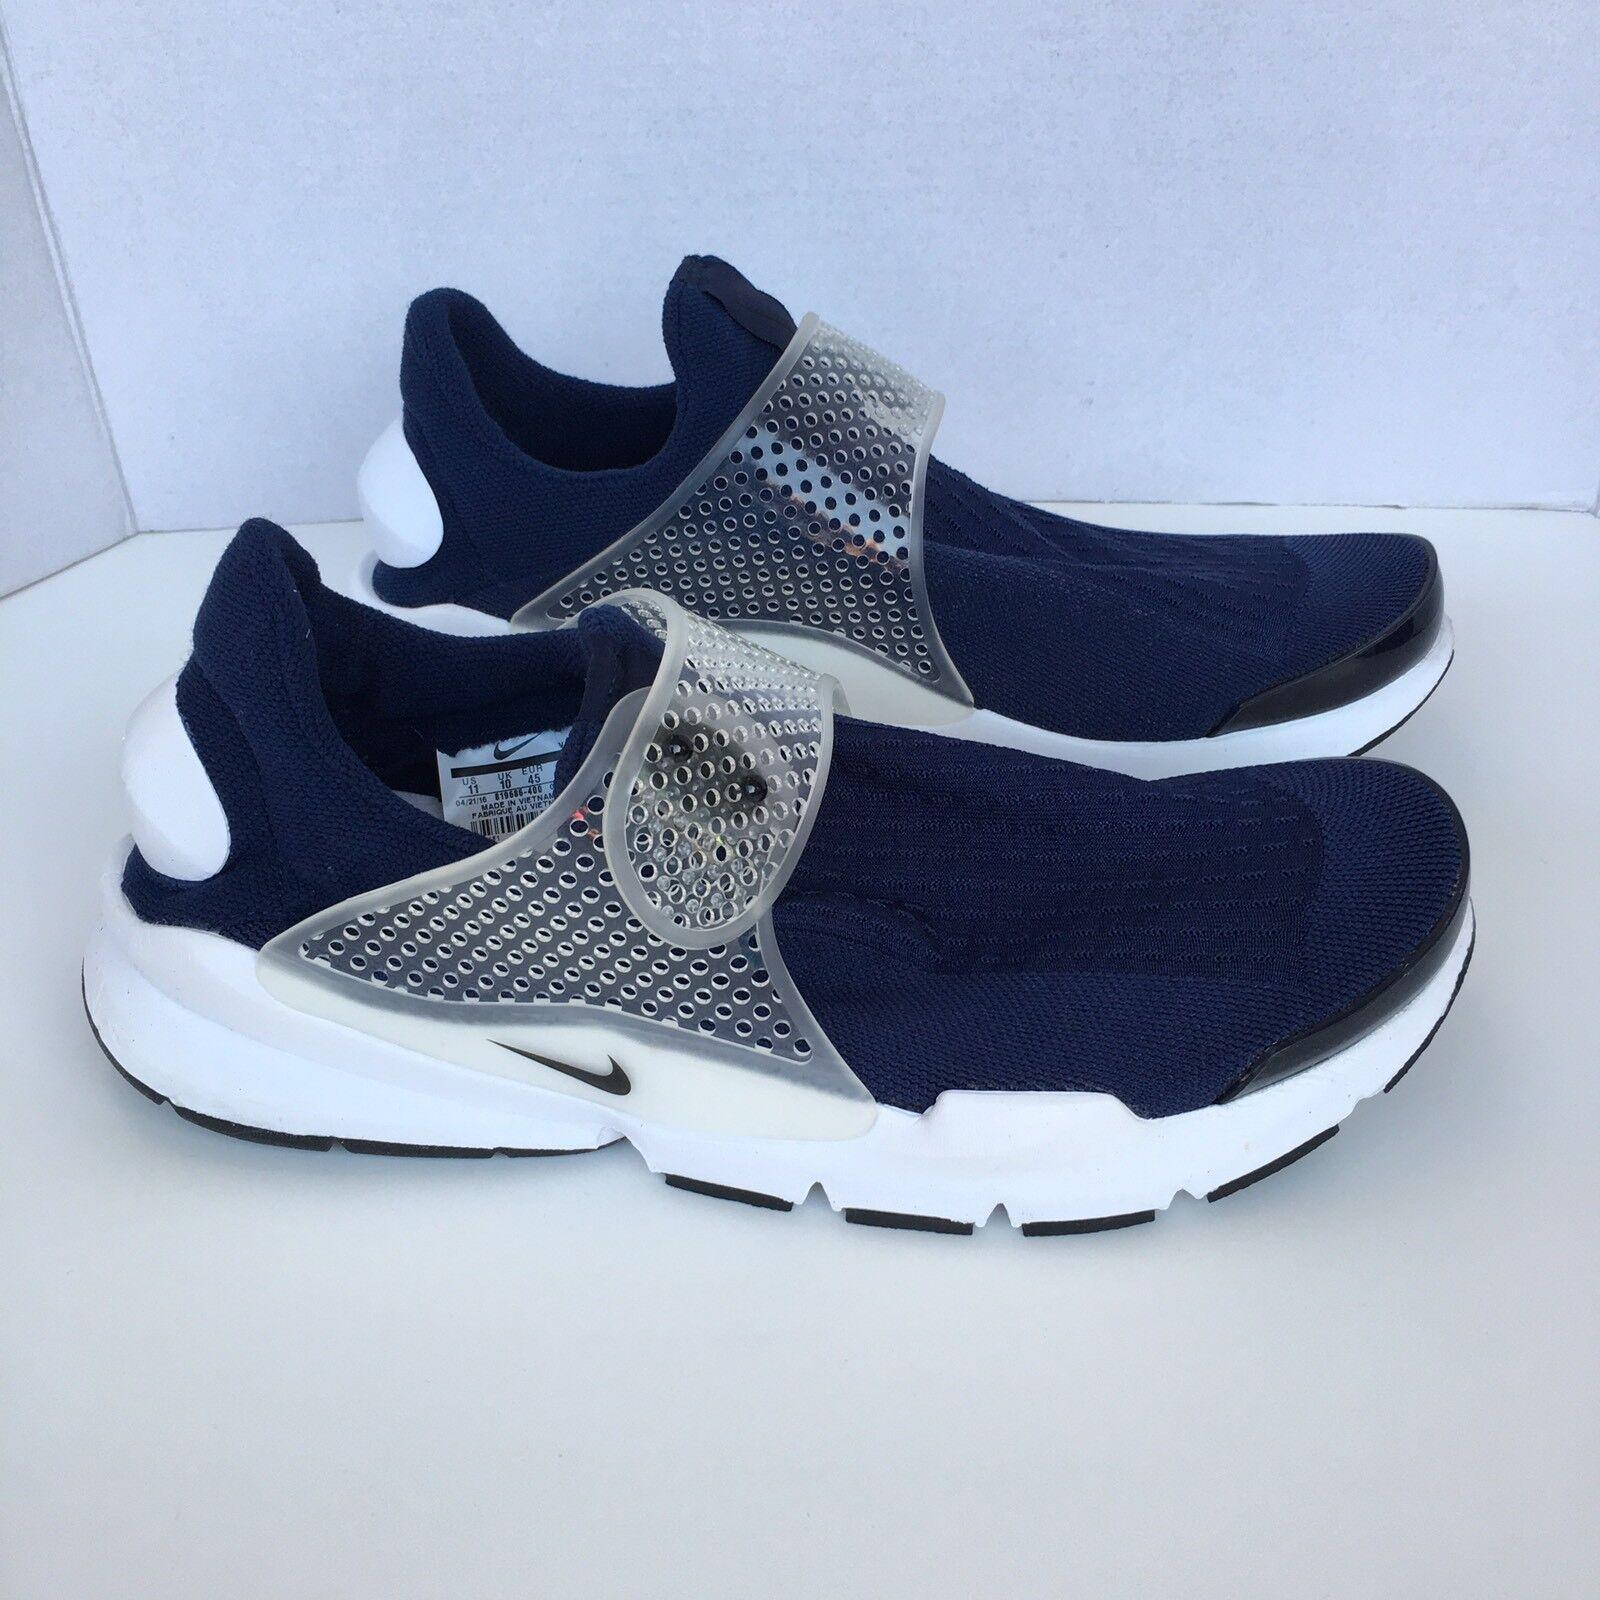 Nike sock freccia blu - bianco dimensioni mezzanotte marina 819686-400 kjcrd